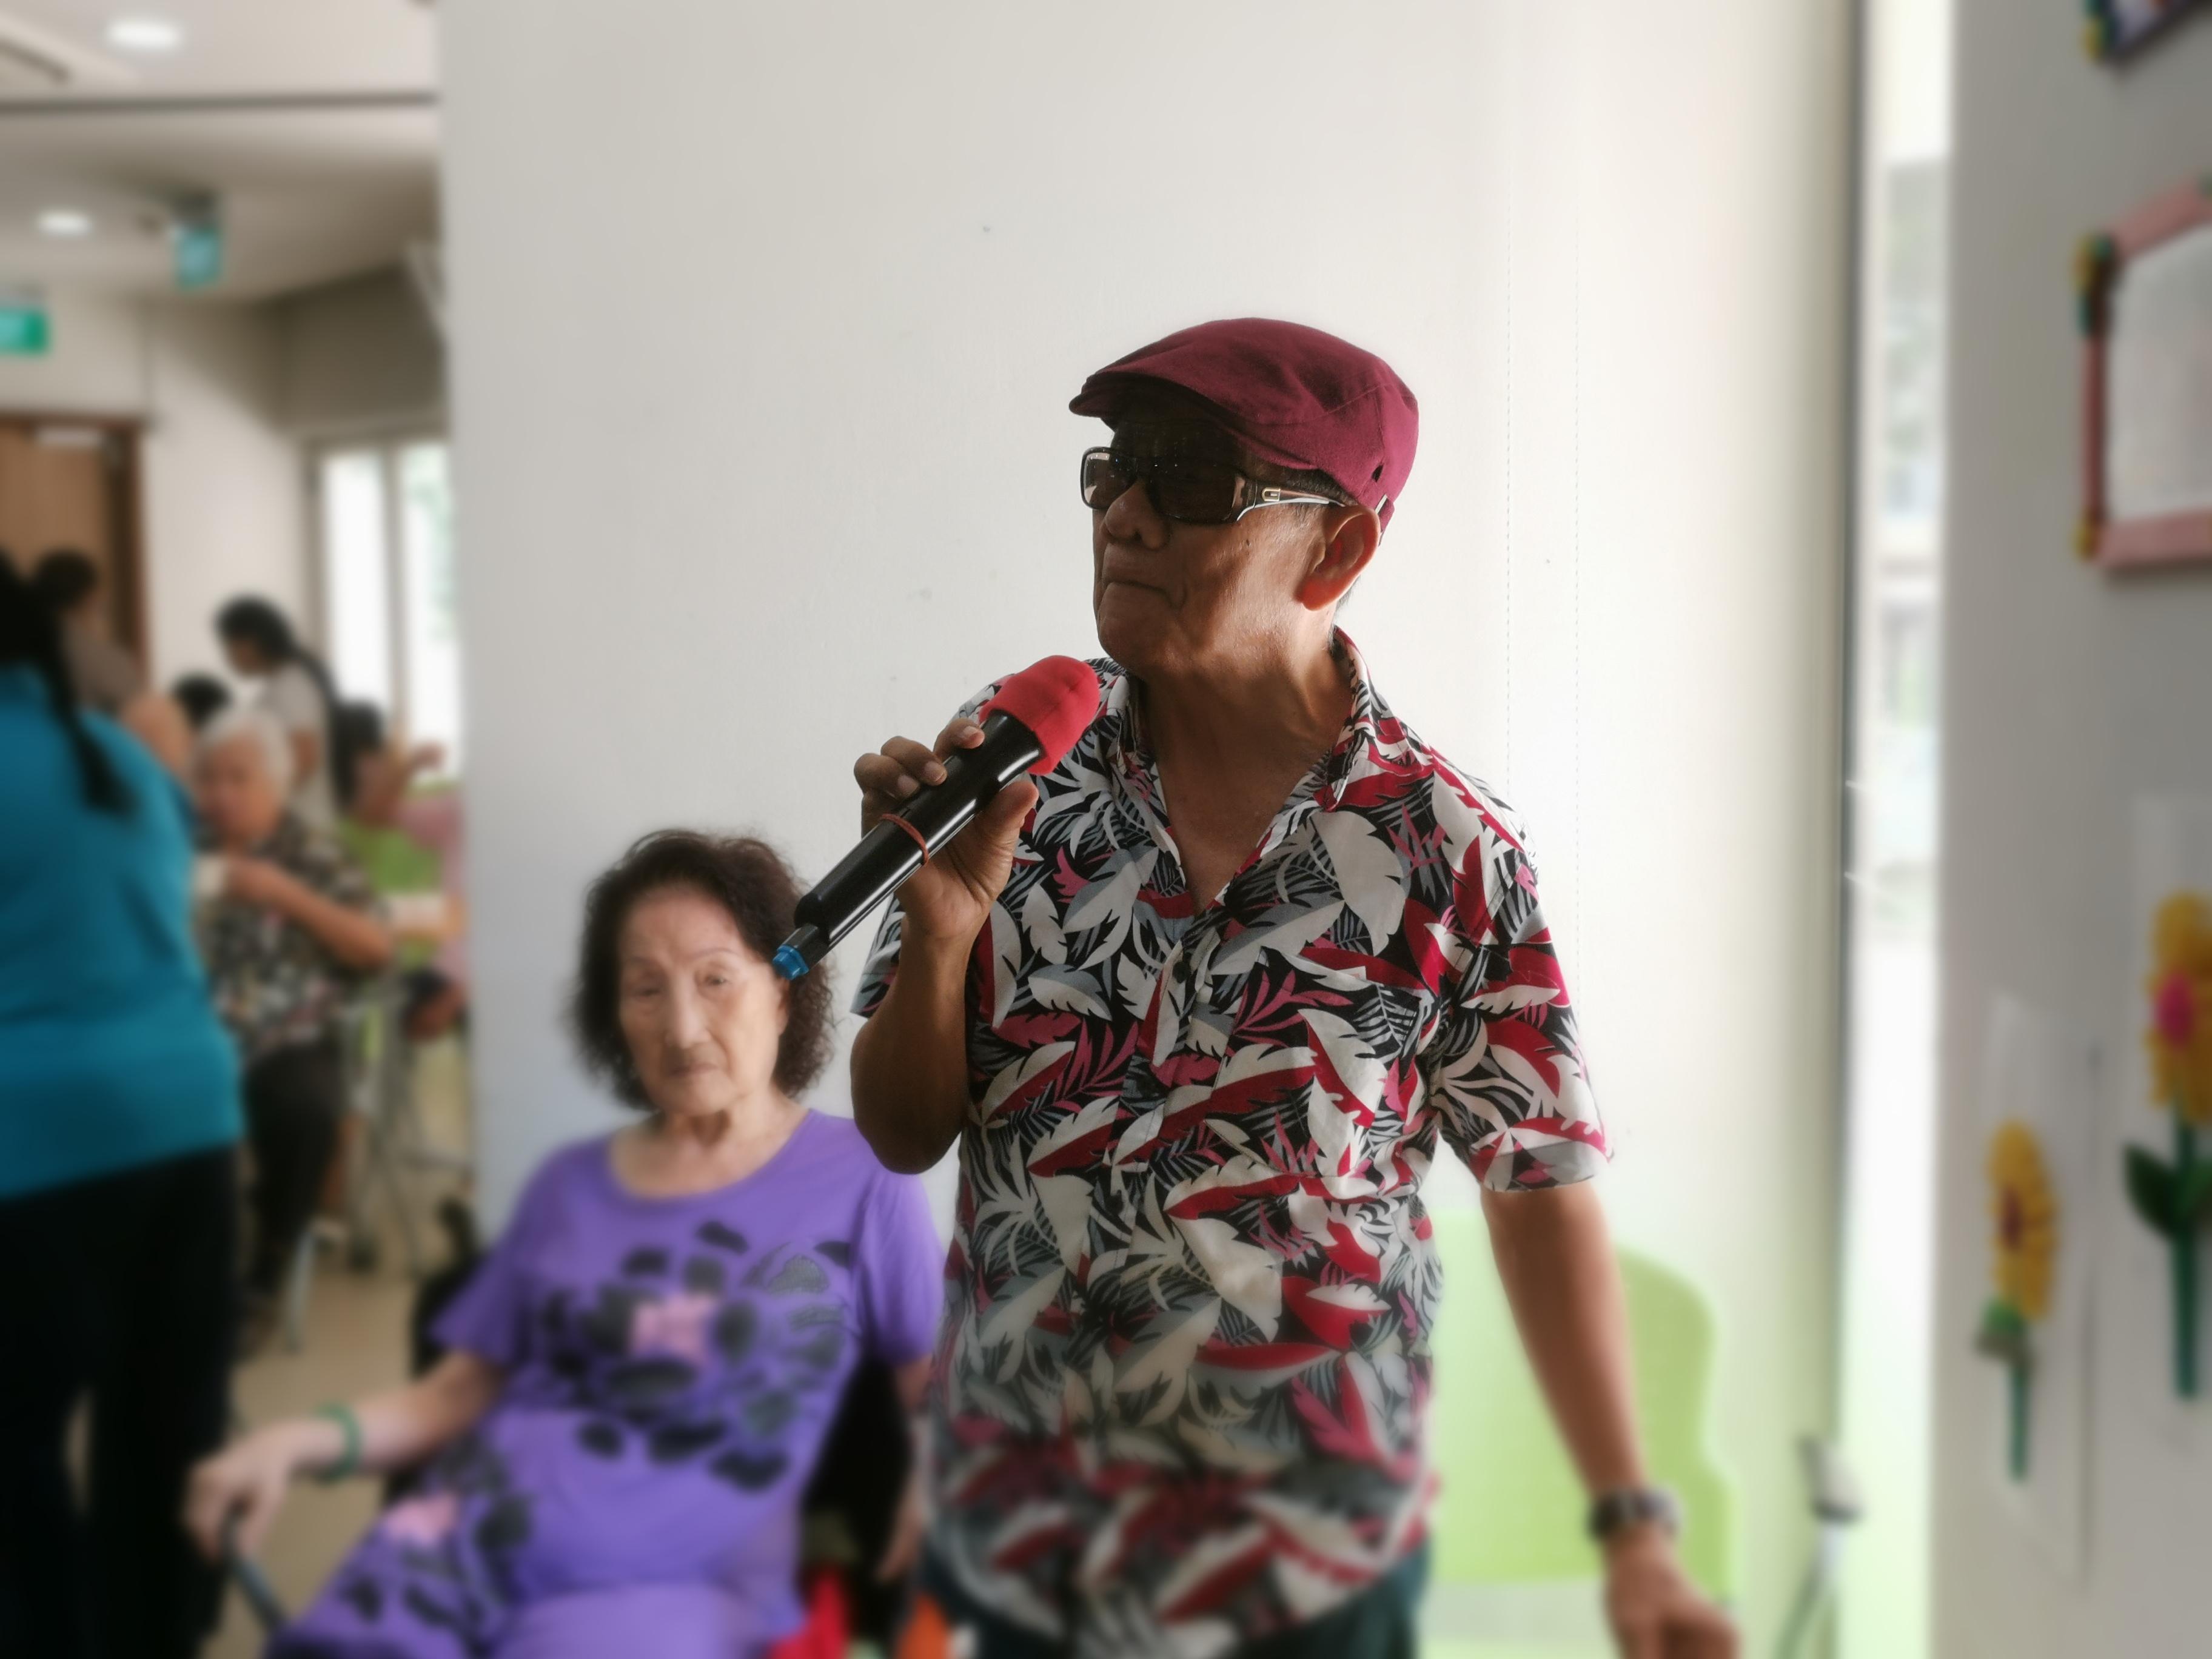 To Give is To Receive - Mr John Wee, a rehab elder turned volunteer